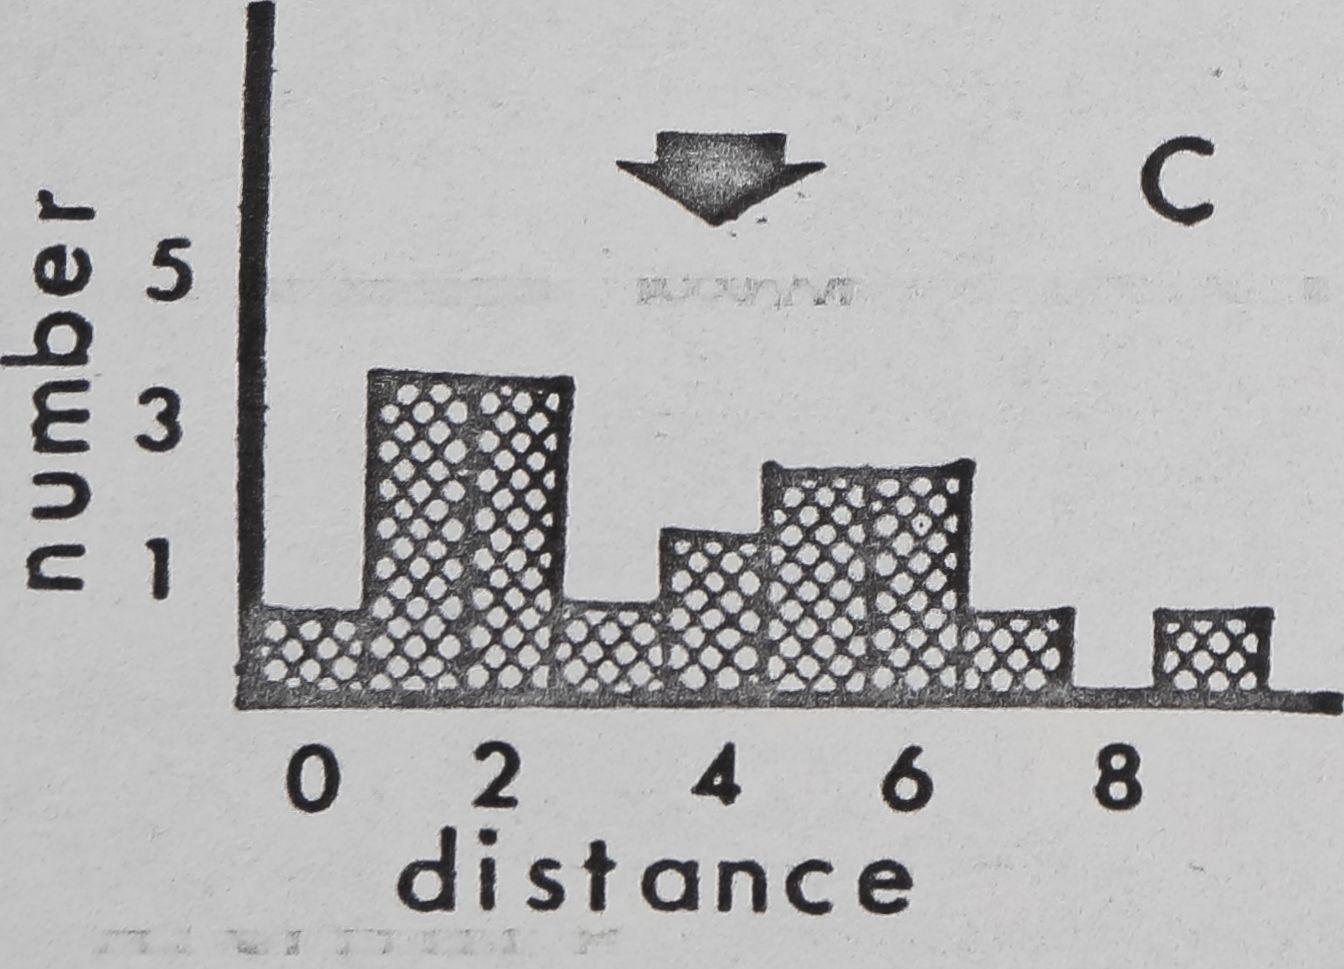 1979-ComparativeStudiesOfDictynaAnd-8